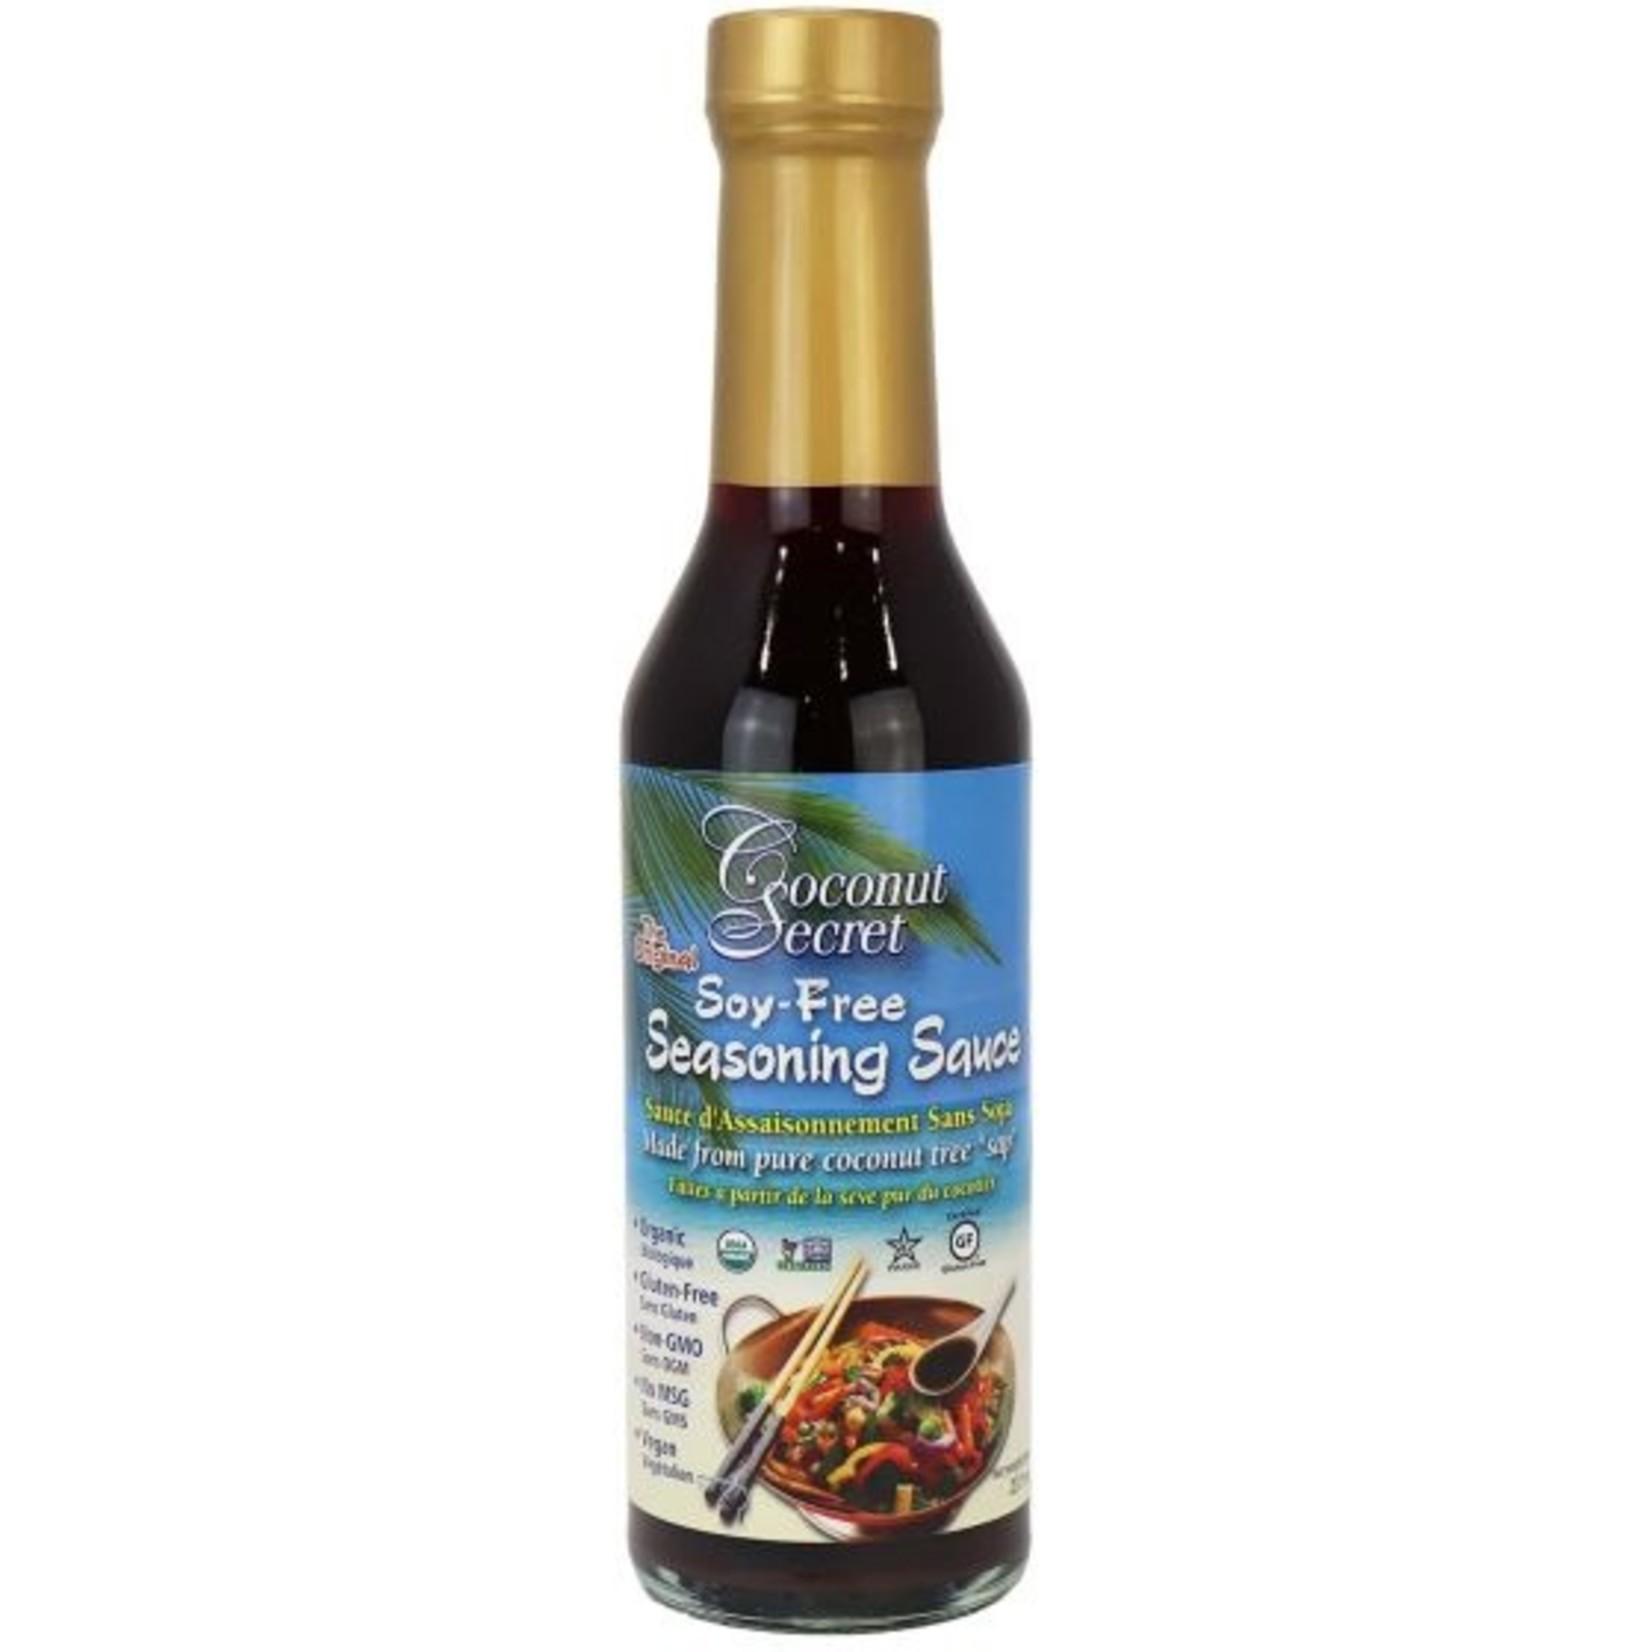 Coconut Secret Coconut Secret Soy Free Seasoning Sauce 237ml